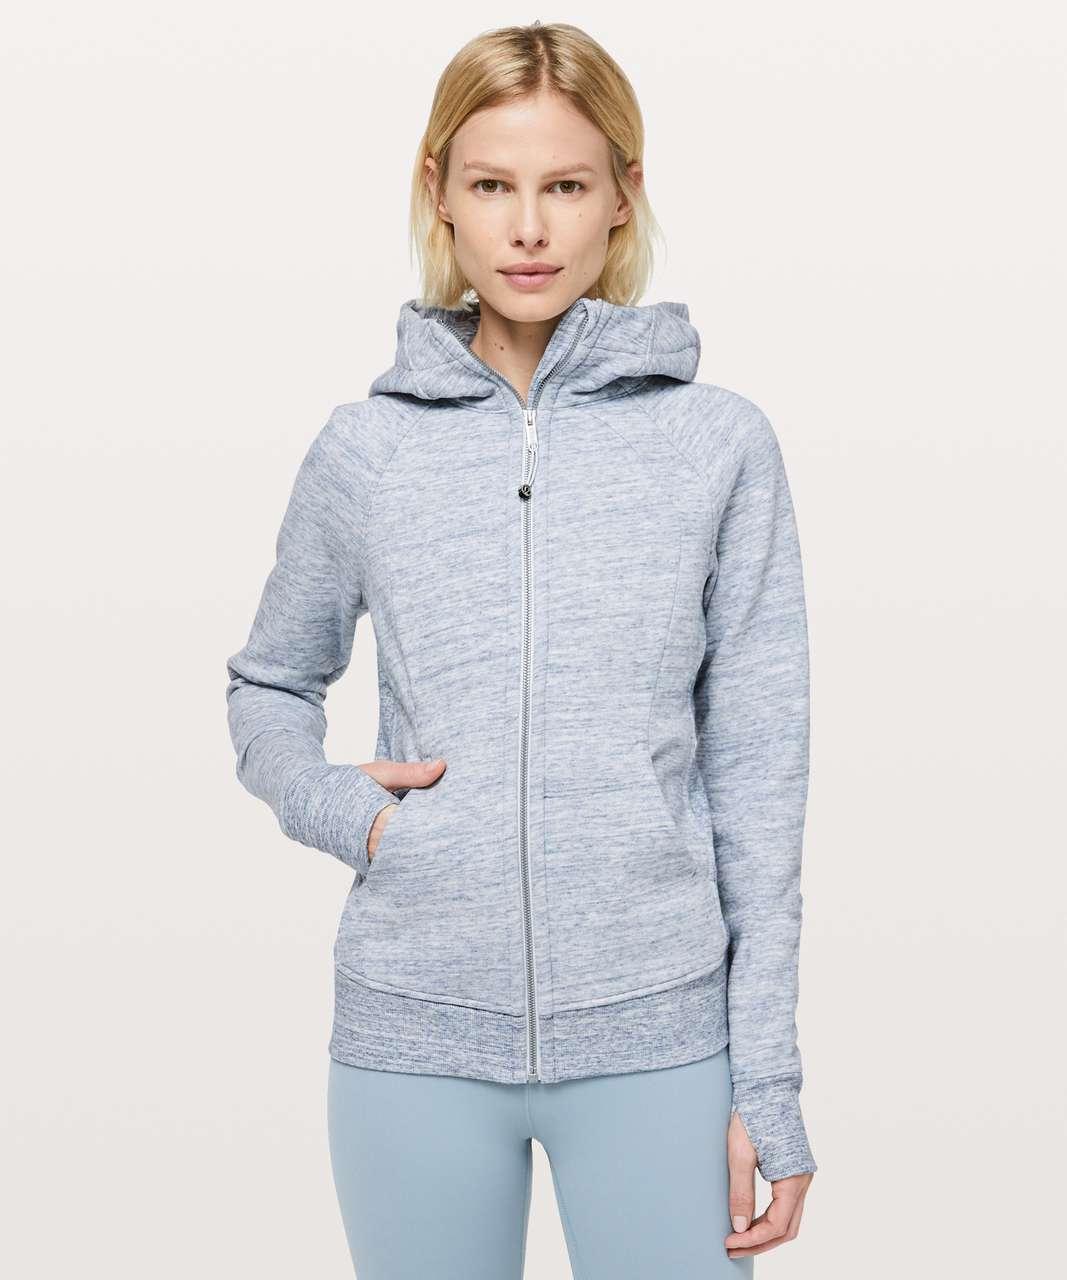 Lululemon Scuba Hoodie *Light Cotton Fleece - Heathered Space Dyed Nimbus